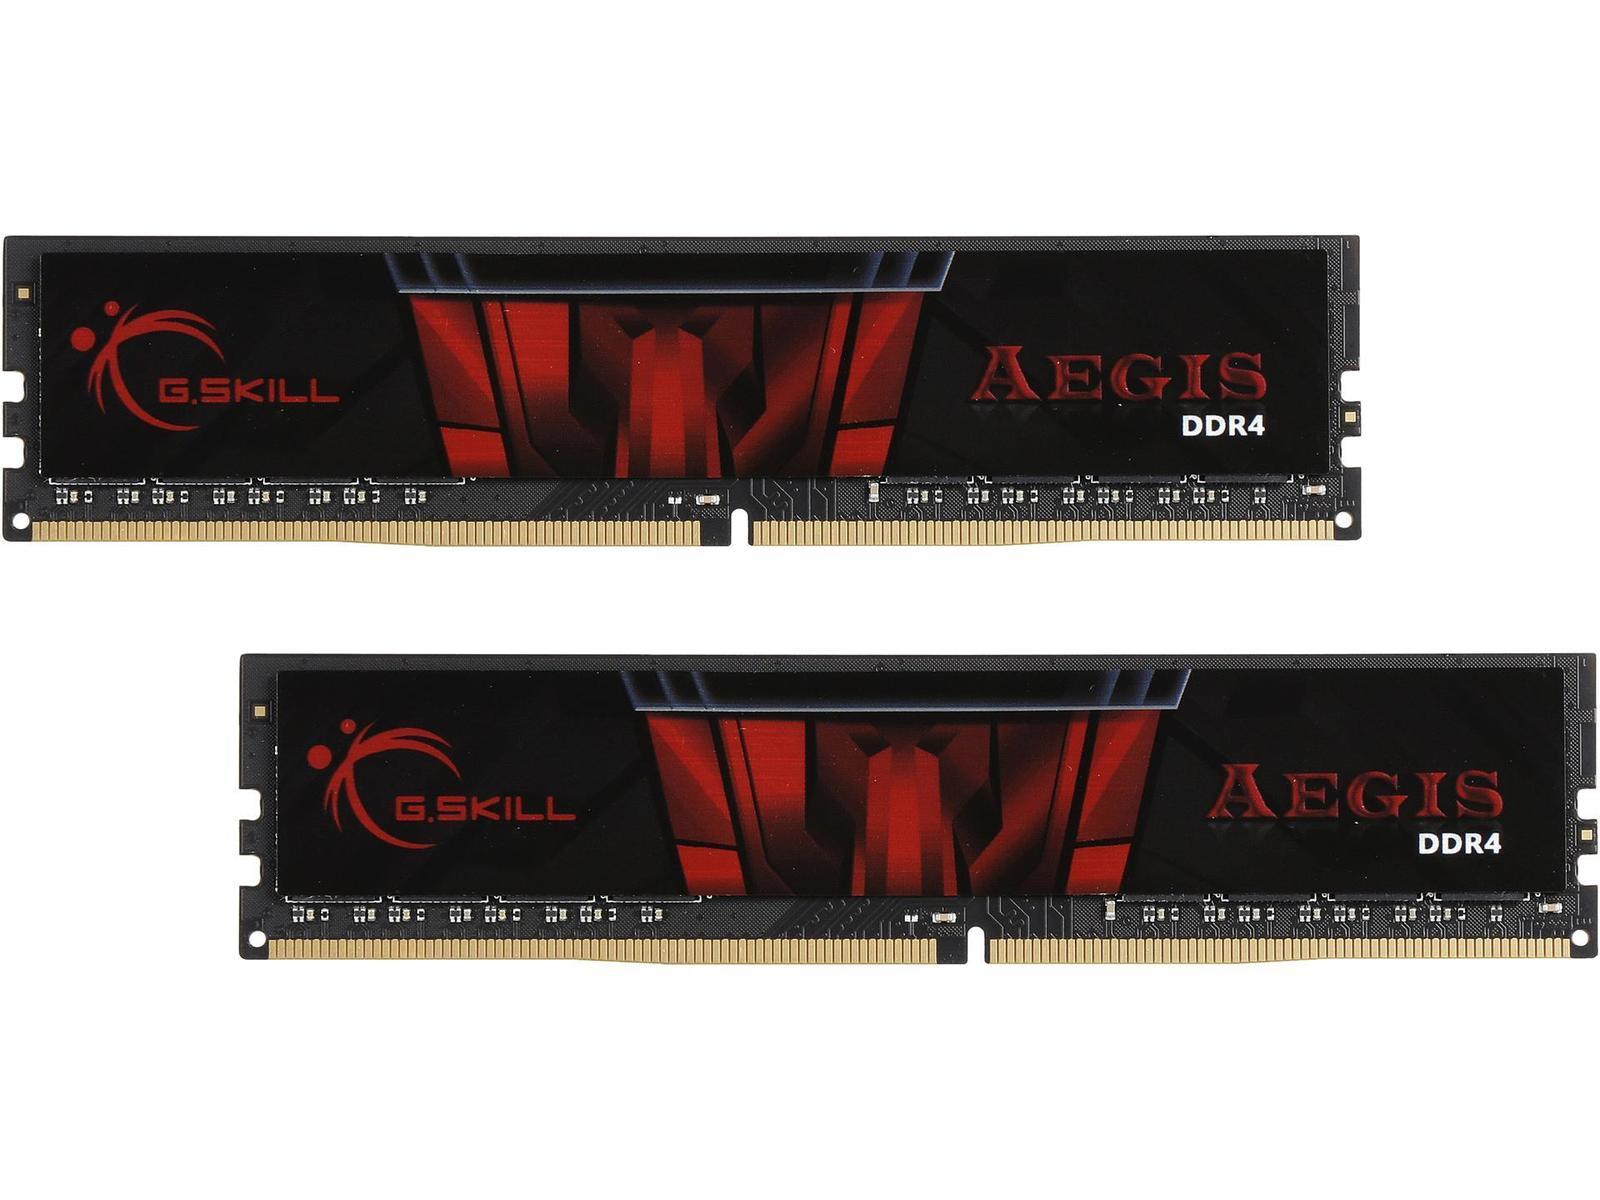 G.Skill Aegis 16 GB (2 x 8 GB) DDR4-3000 CL16 Memory